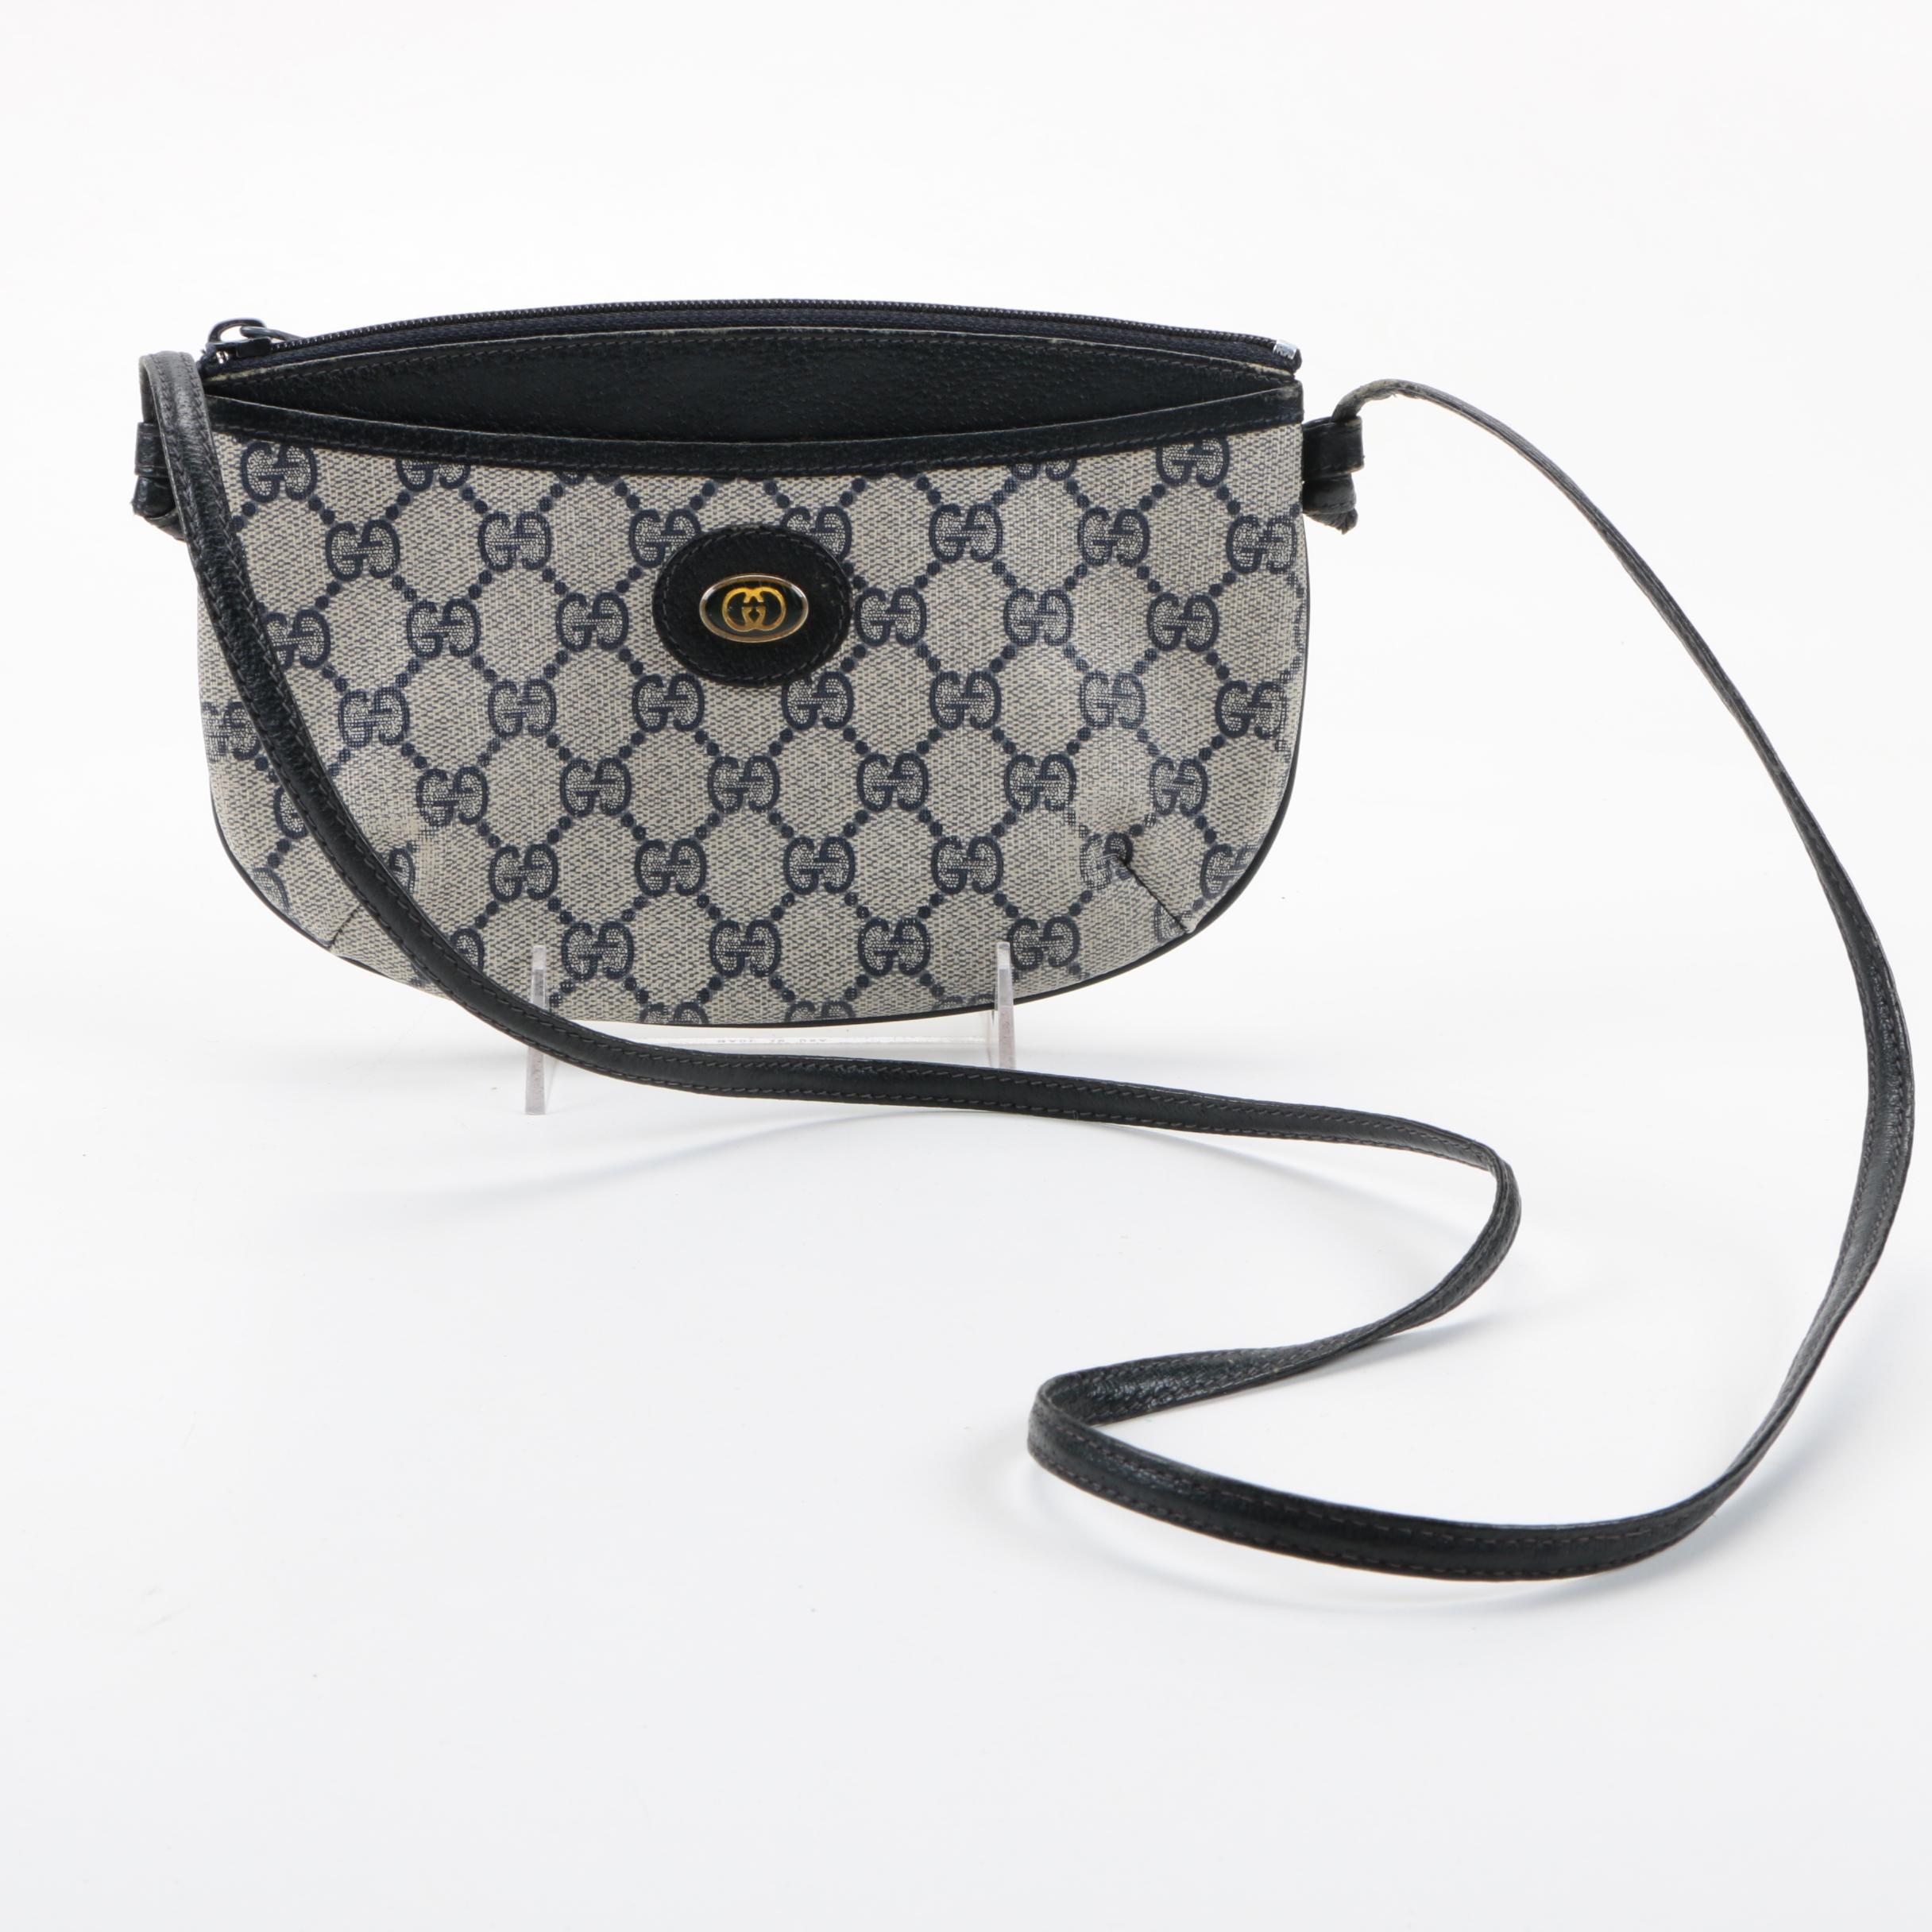 Gucci Supreme Canvas Crossbody Bag